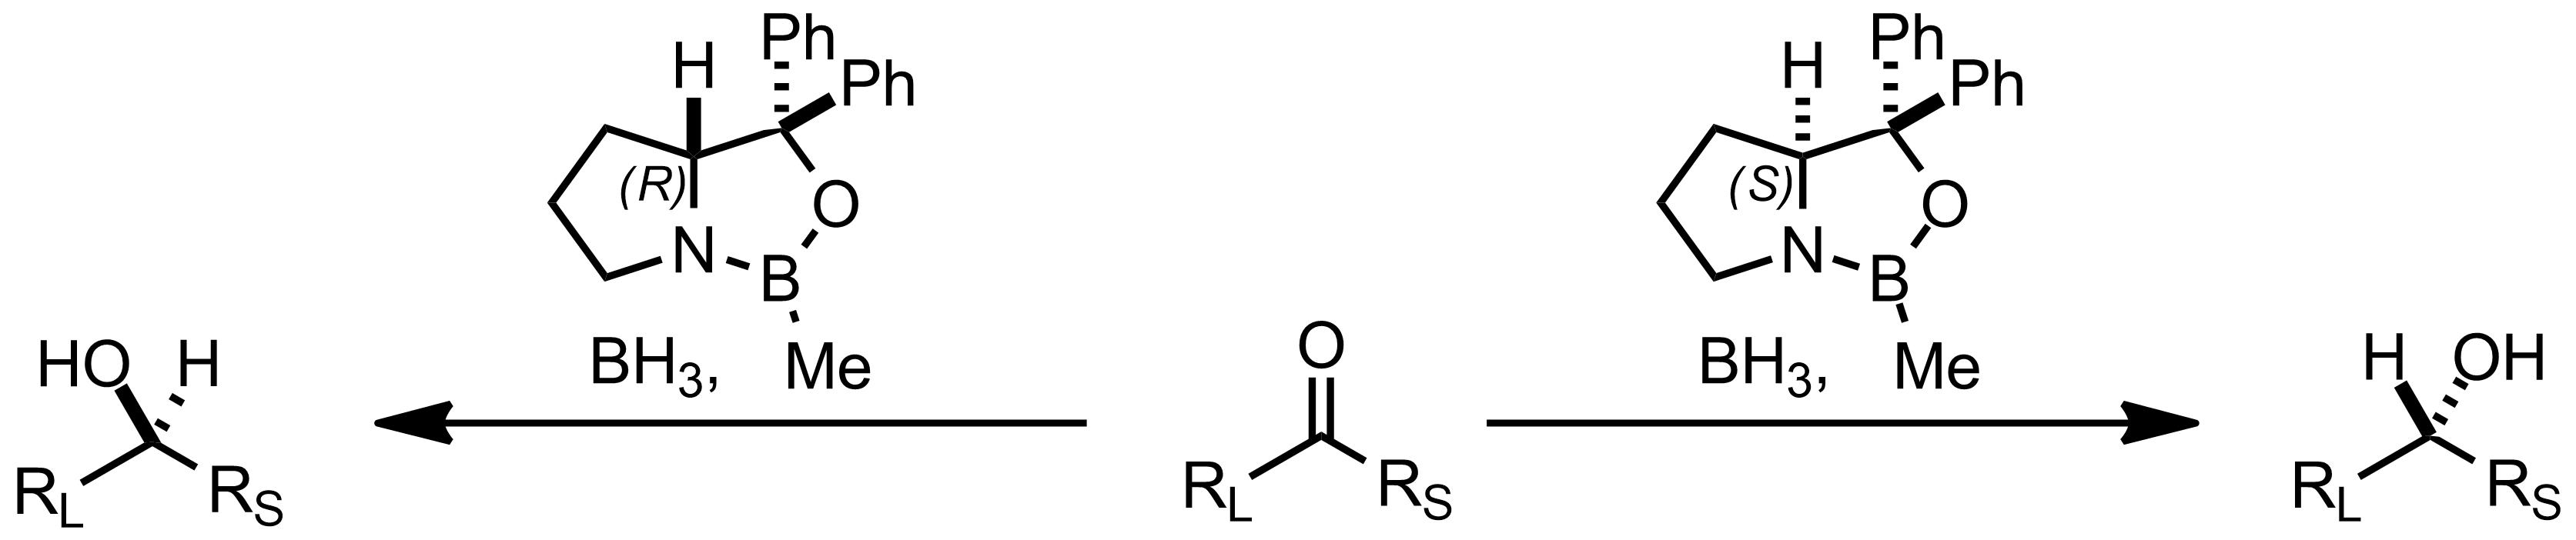 Schematic representation of the Itsuno-Corey Reduction.